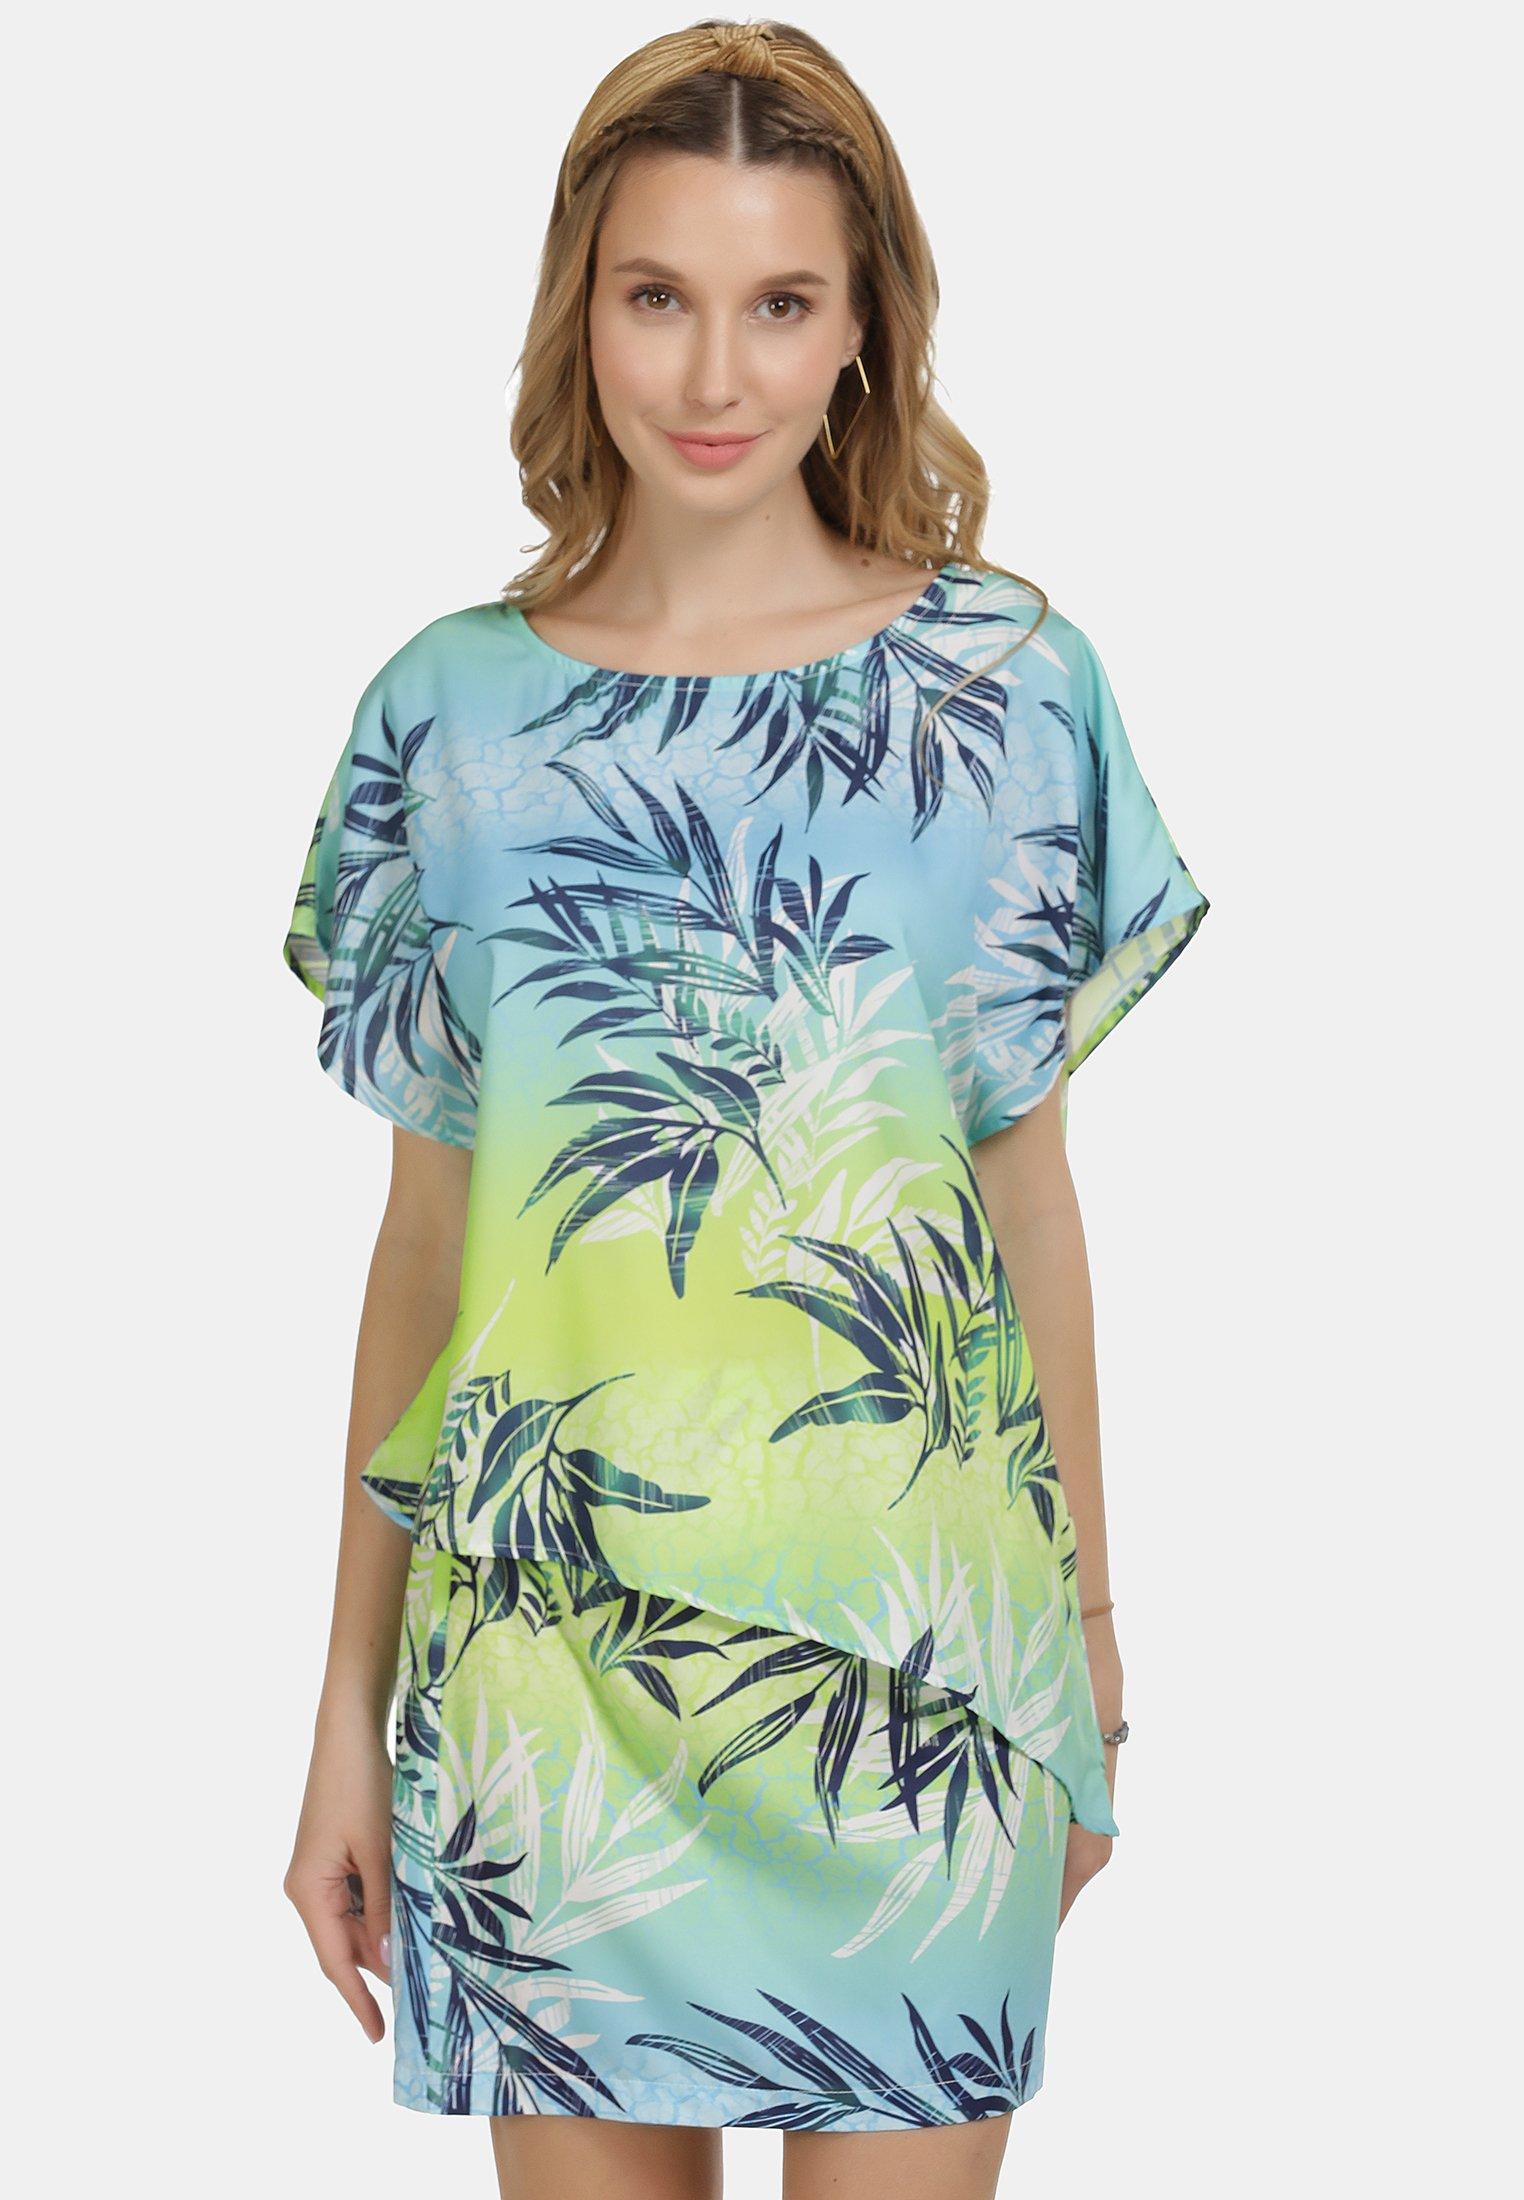 Donna IZIA PRINT-SHIRT - T-shirt con stampa